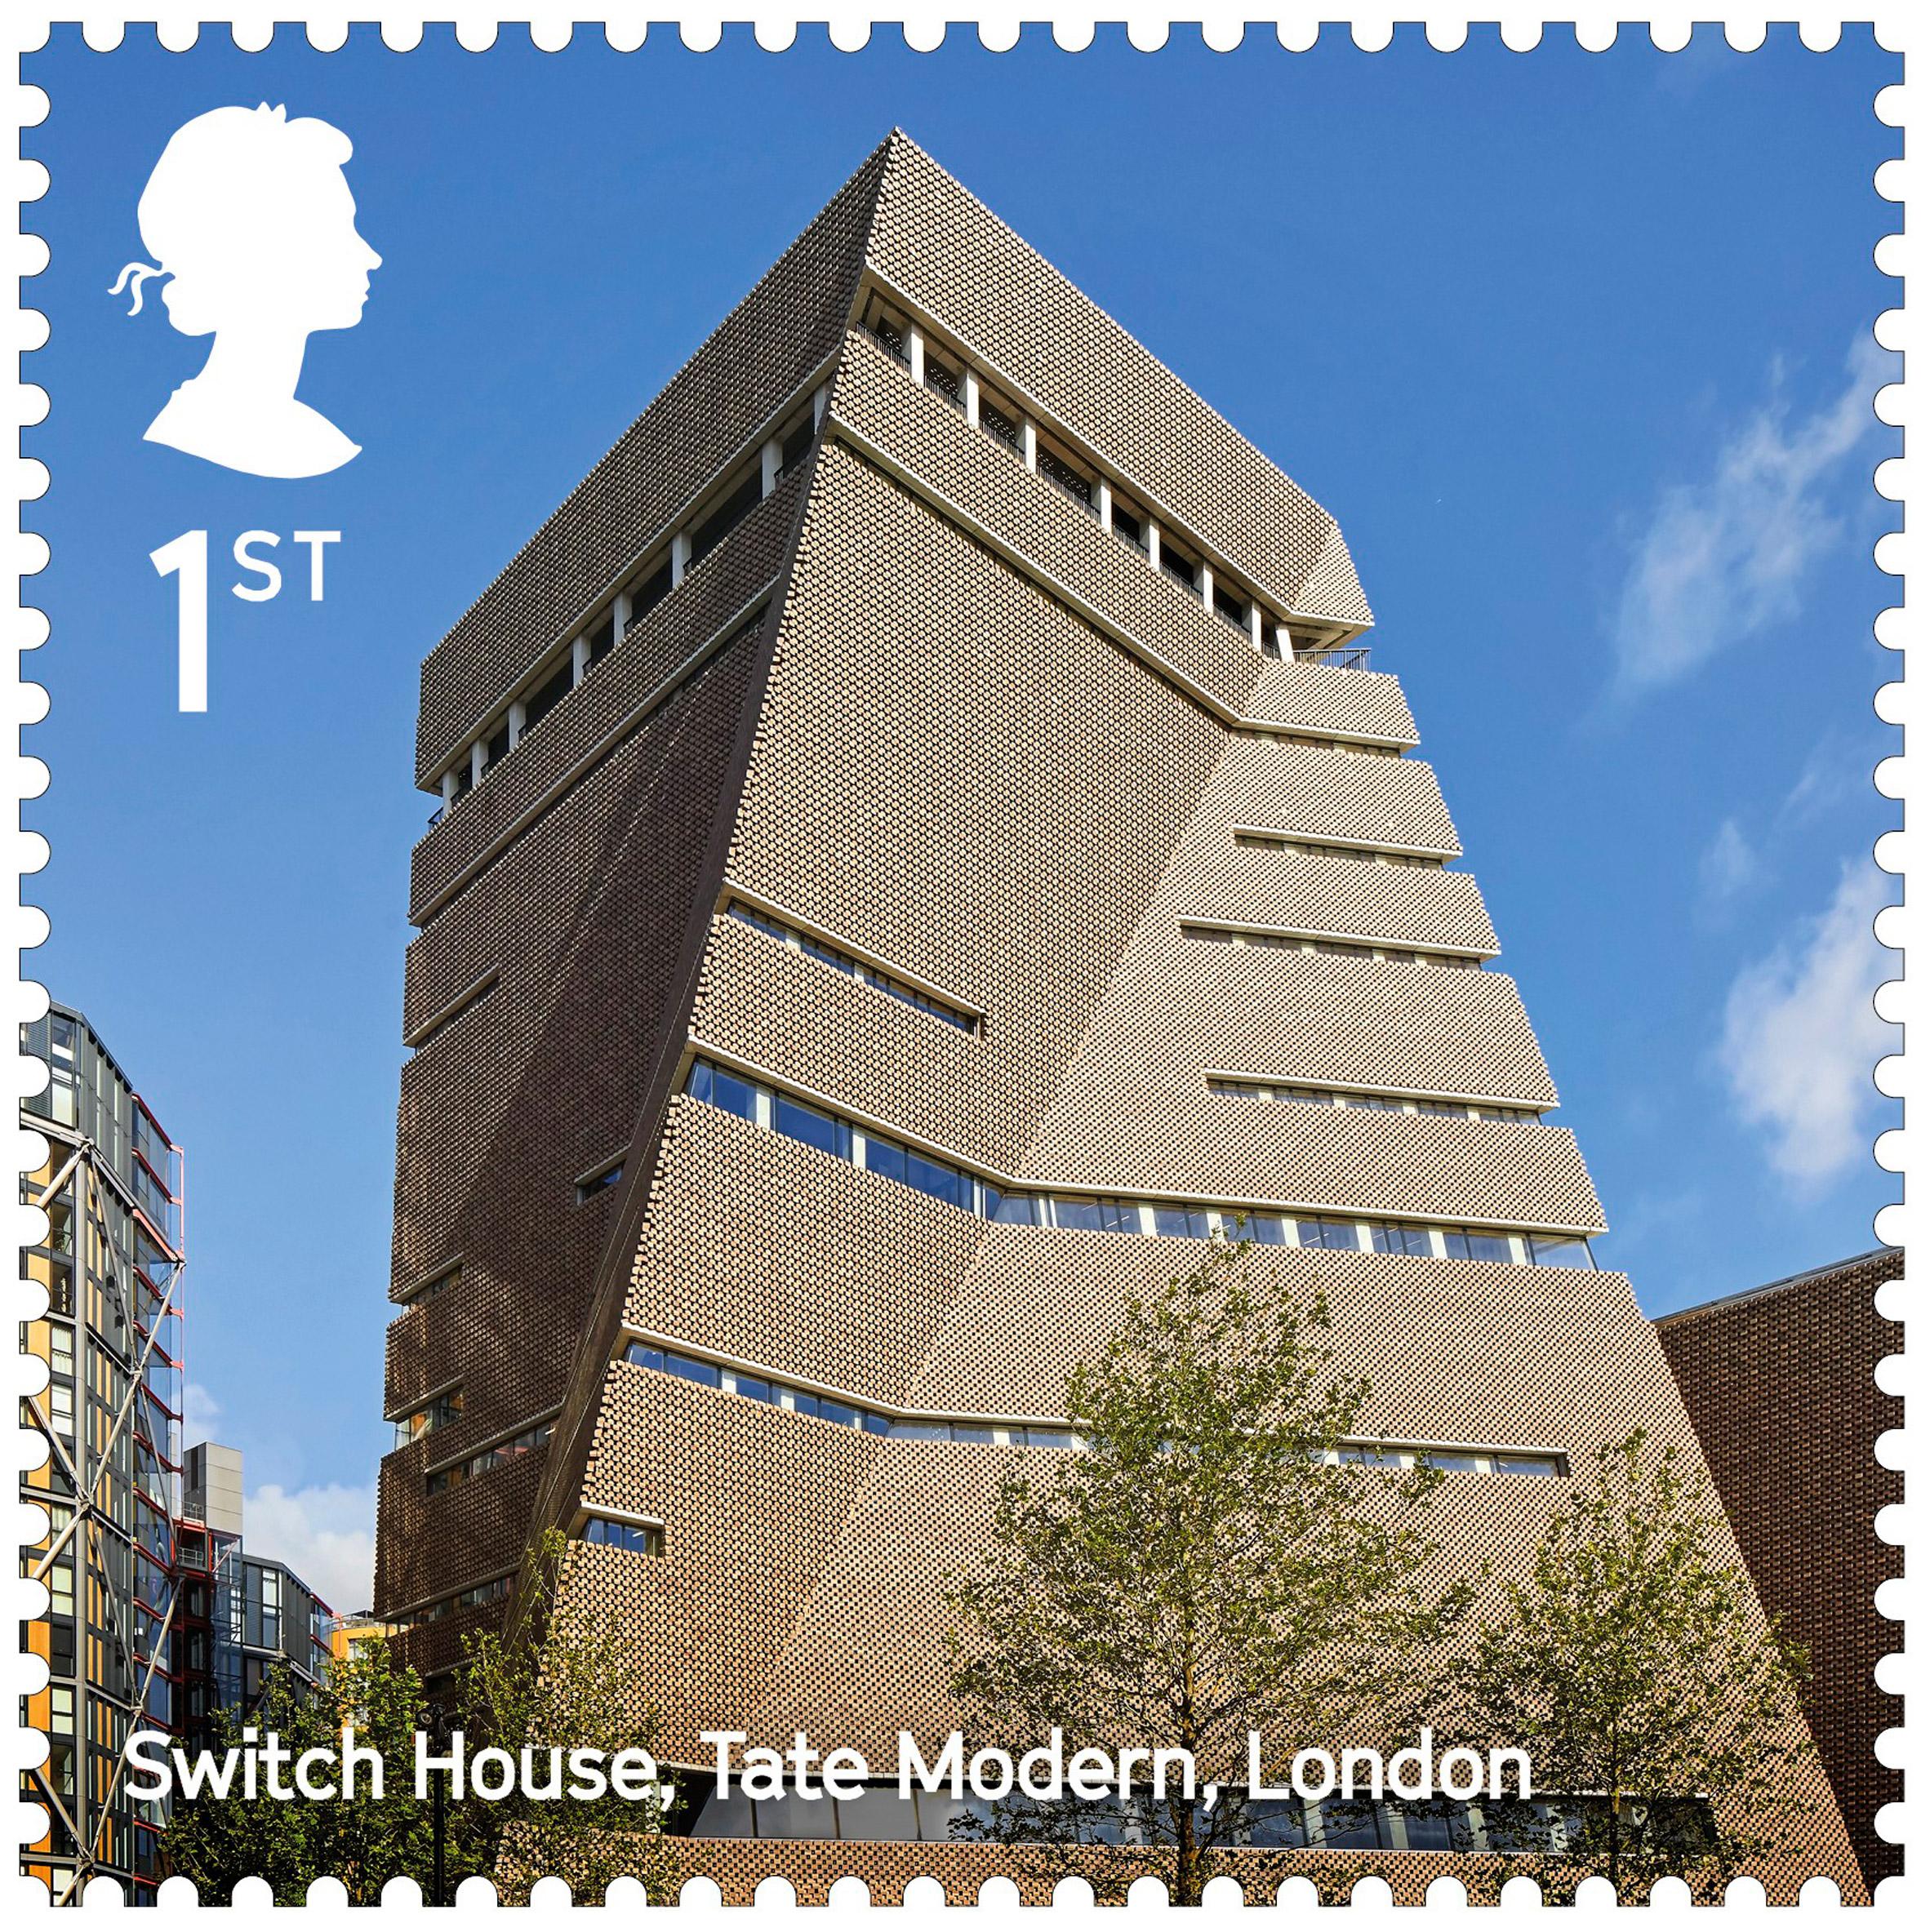 Landmark building stamps